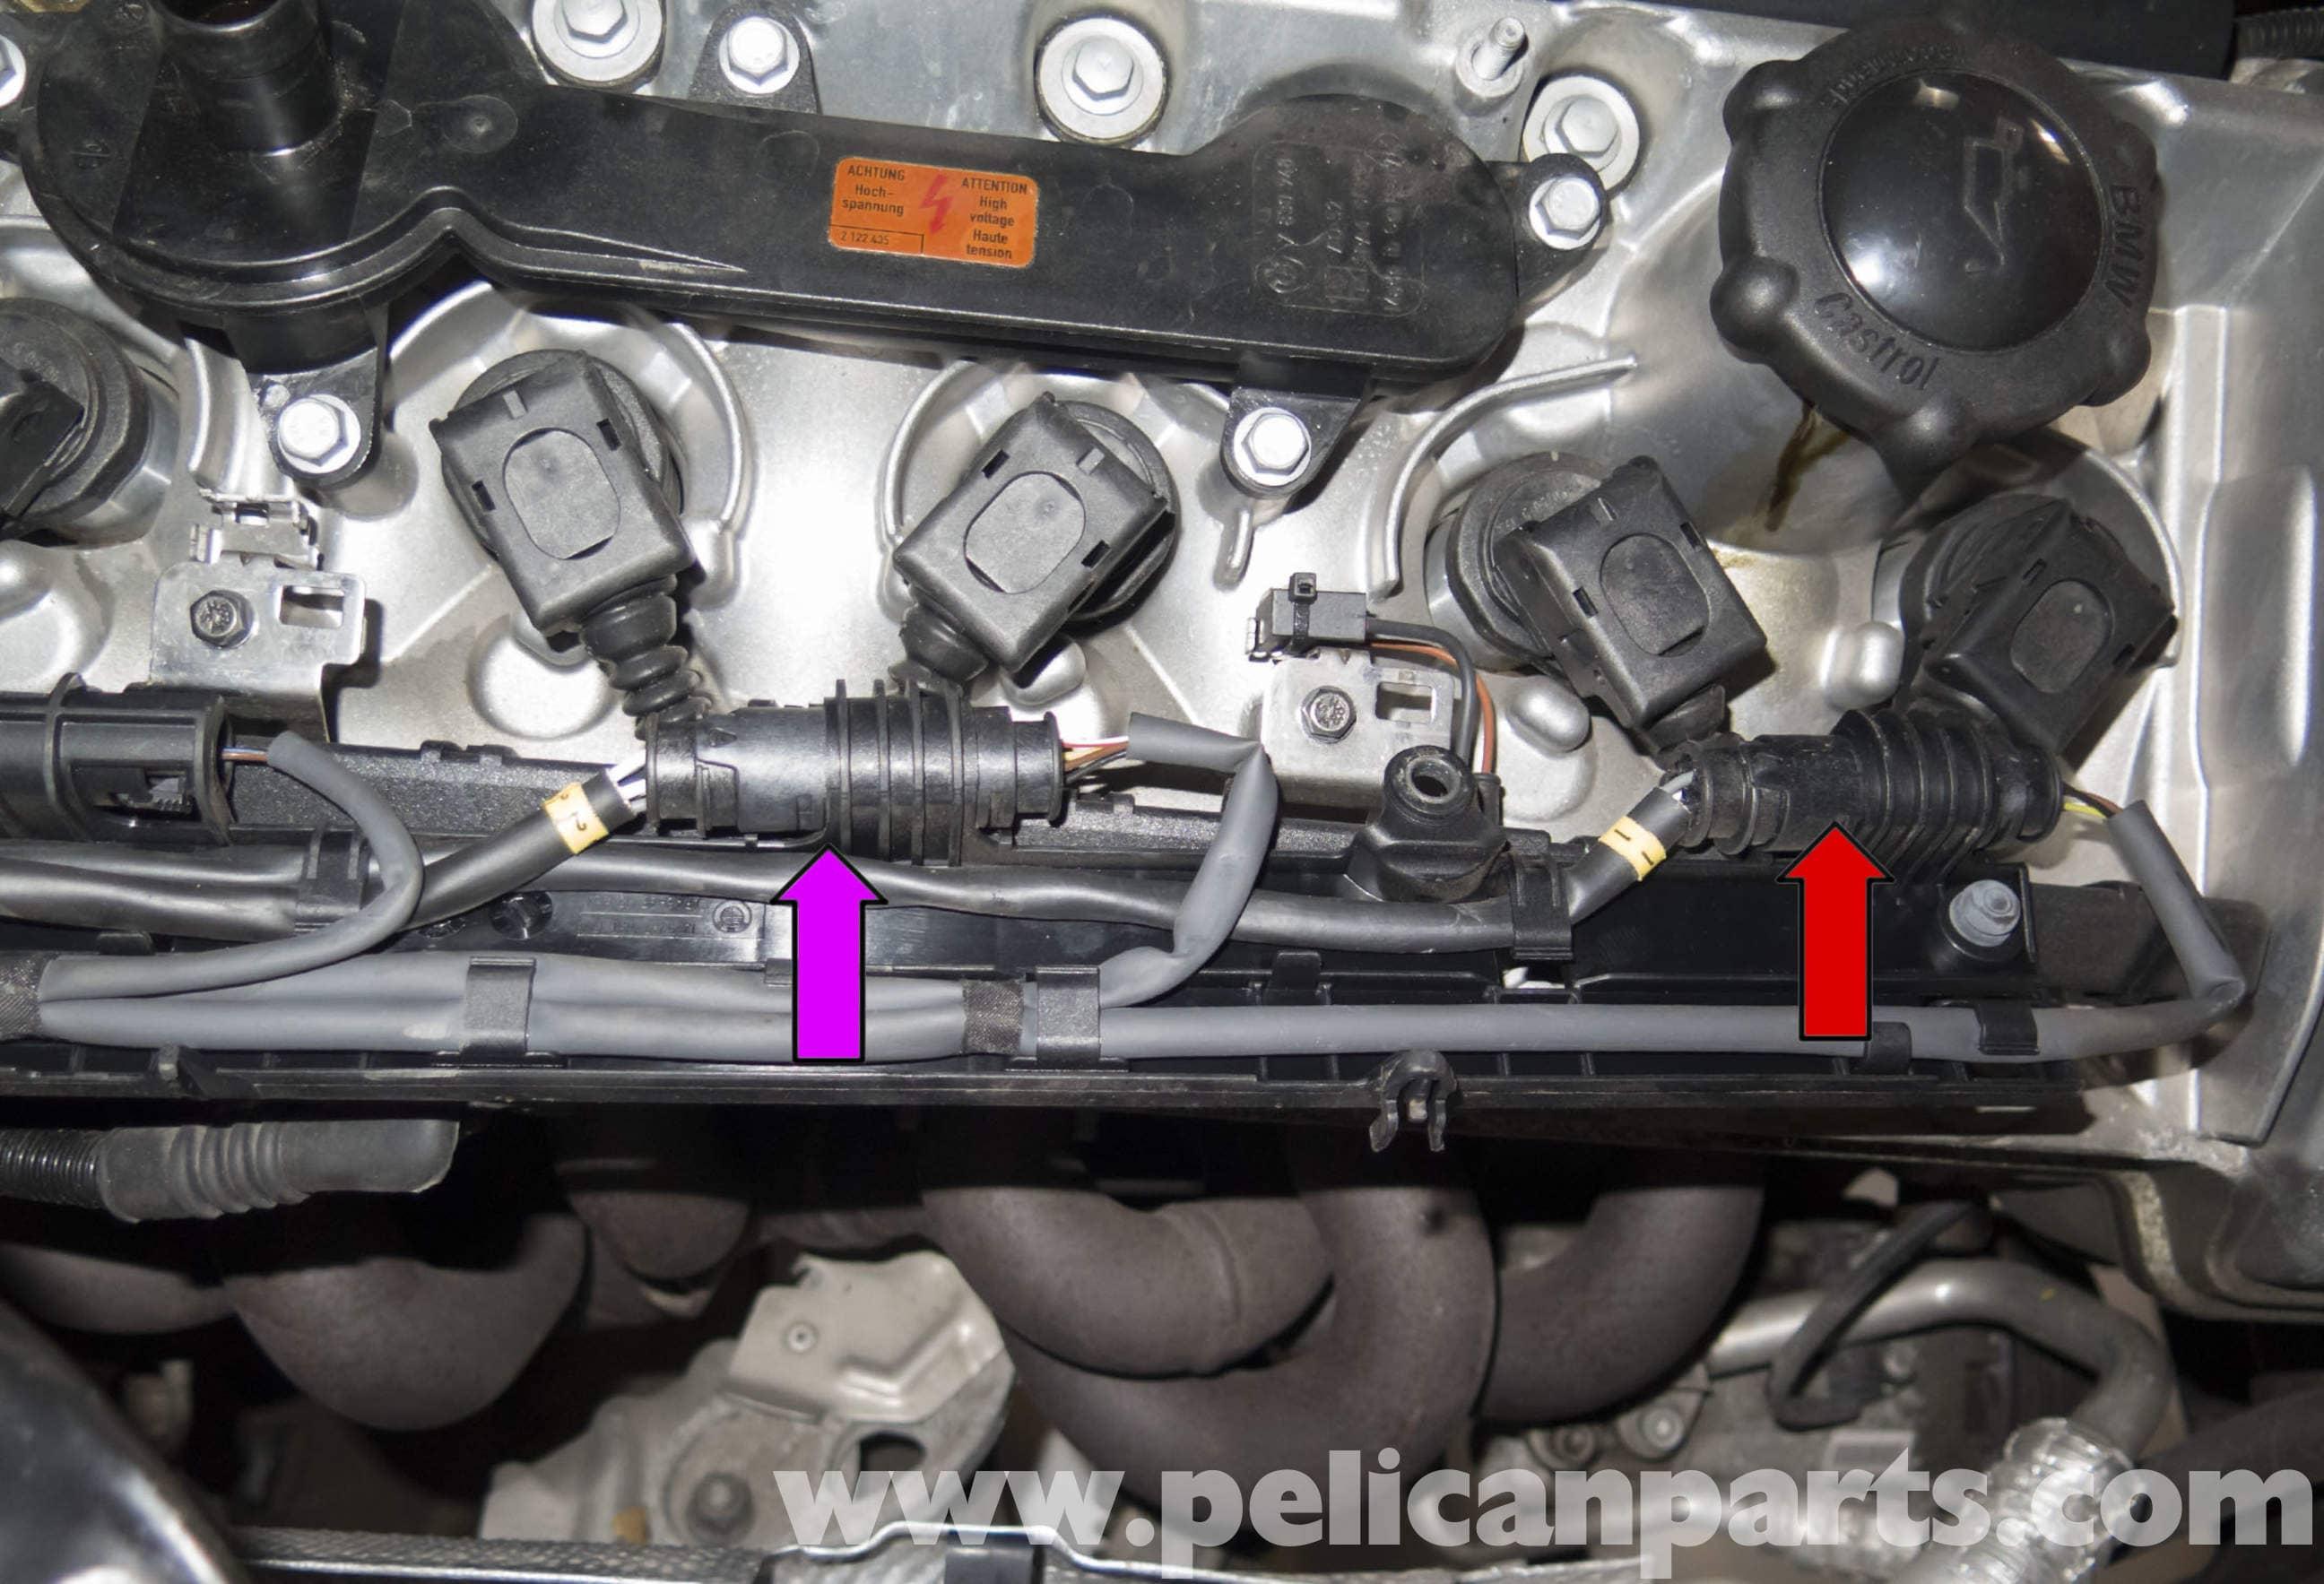 BMW Z4-M S54 Engine Oxygen Sensor Replacement | 2003-2006